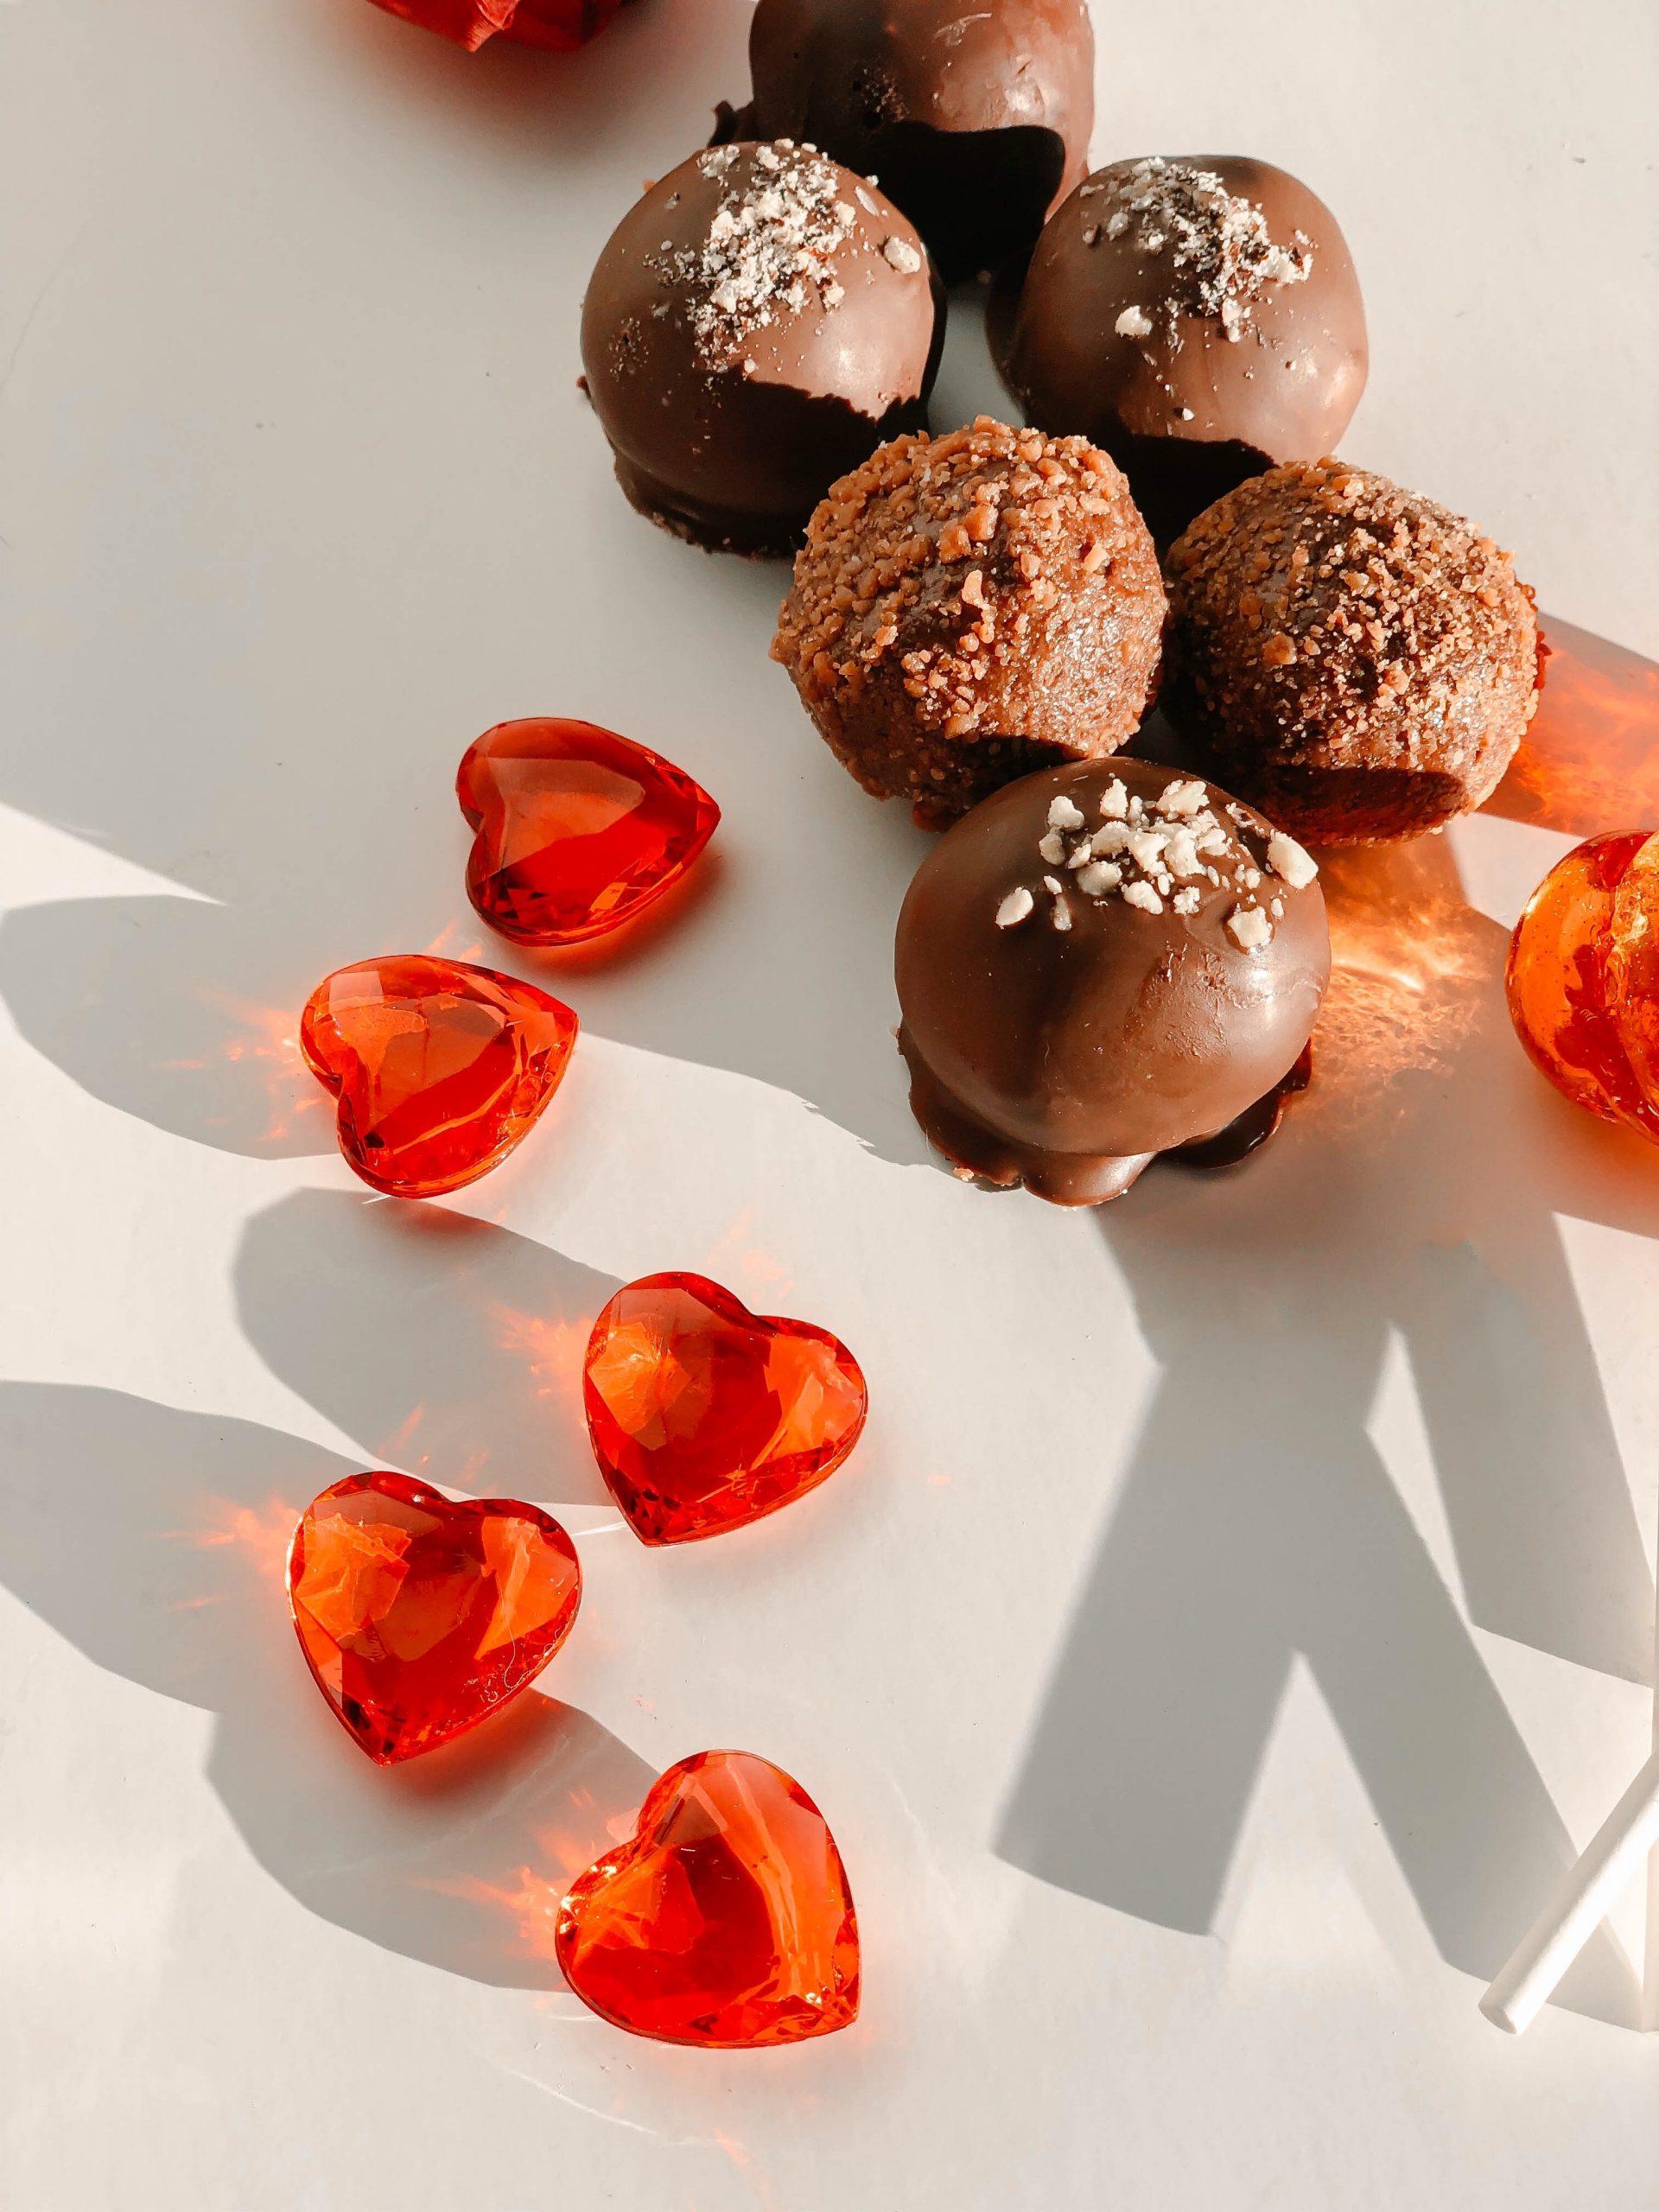 Raspberry Chocolate Truffle by Diet Desires